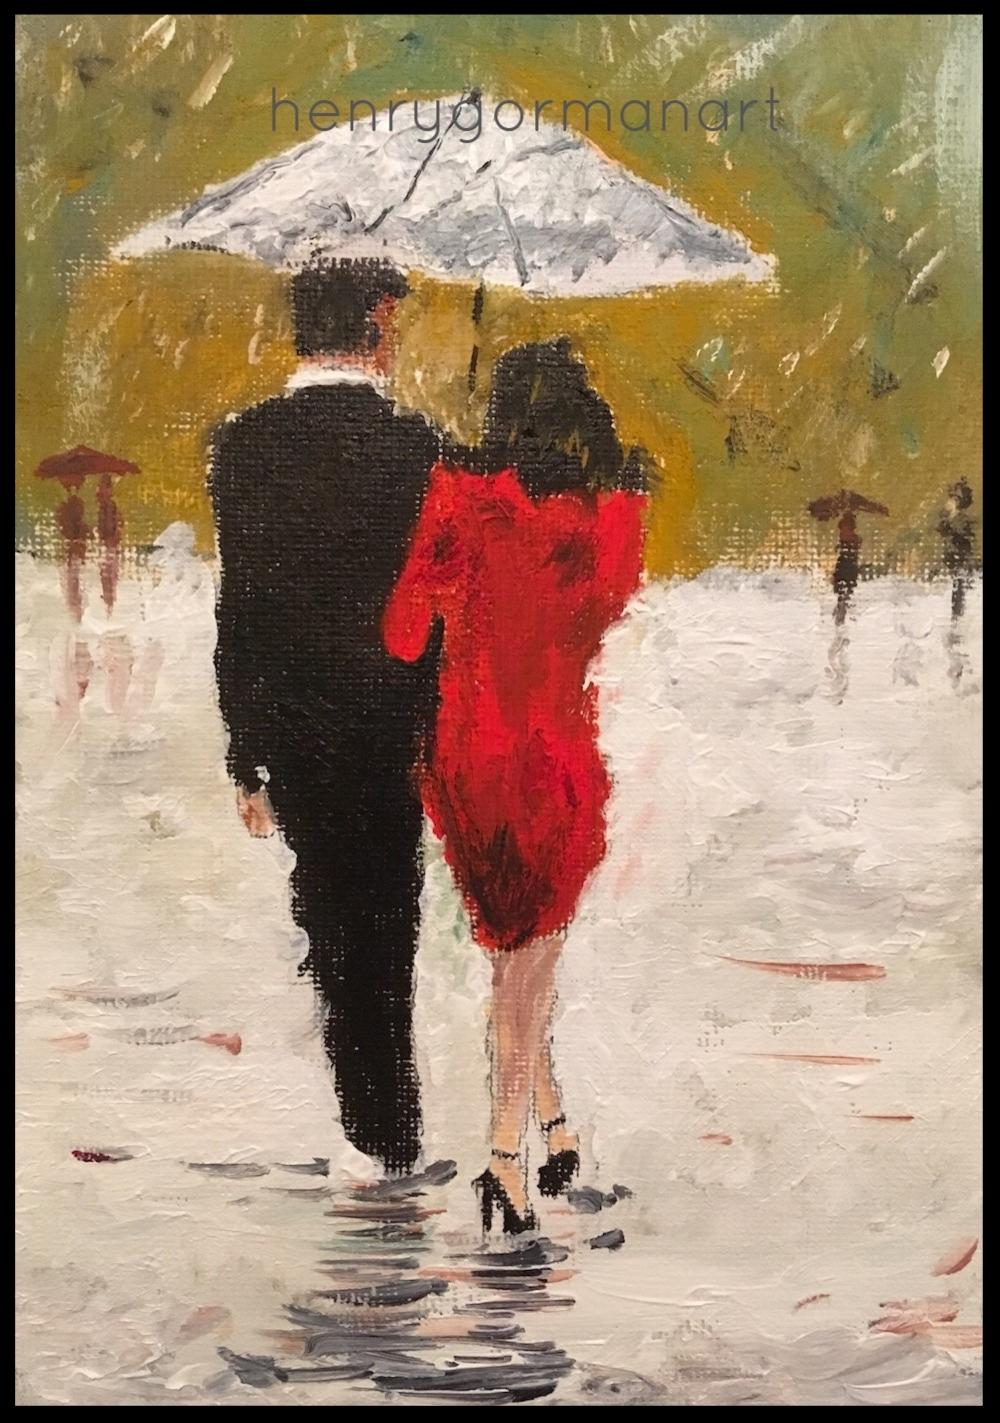 'Couple in the rain'